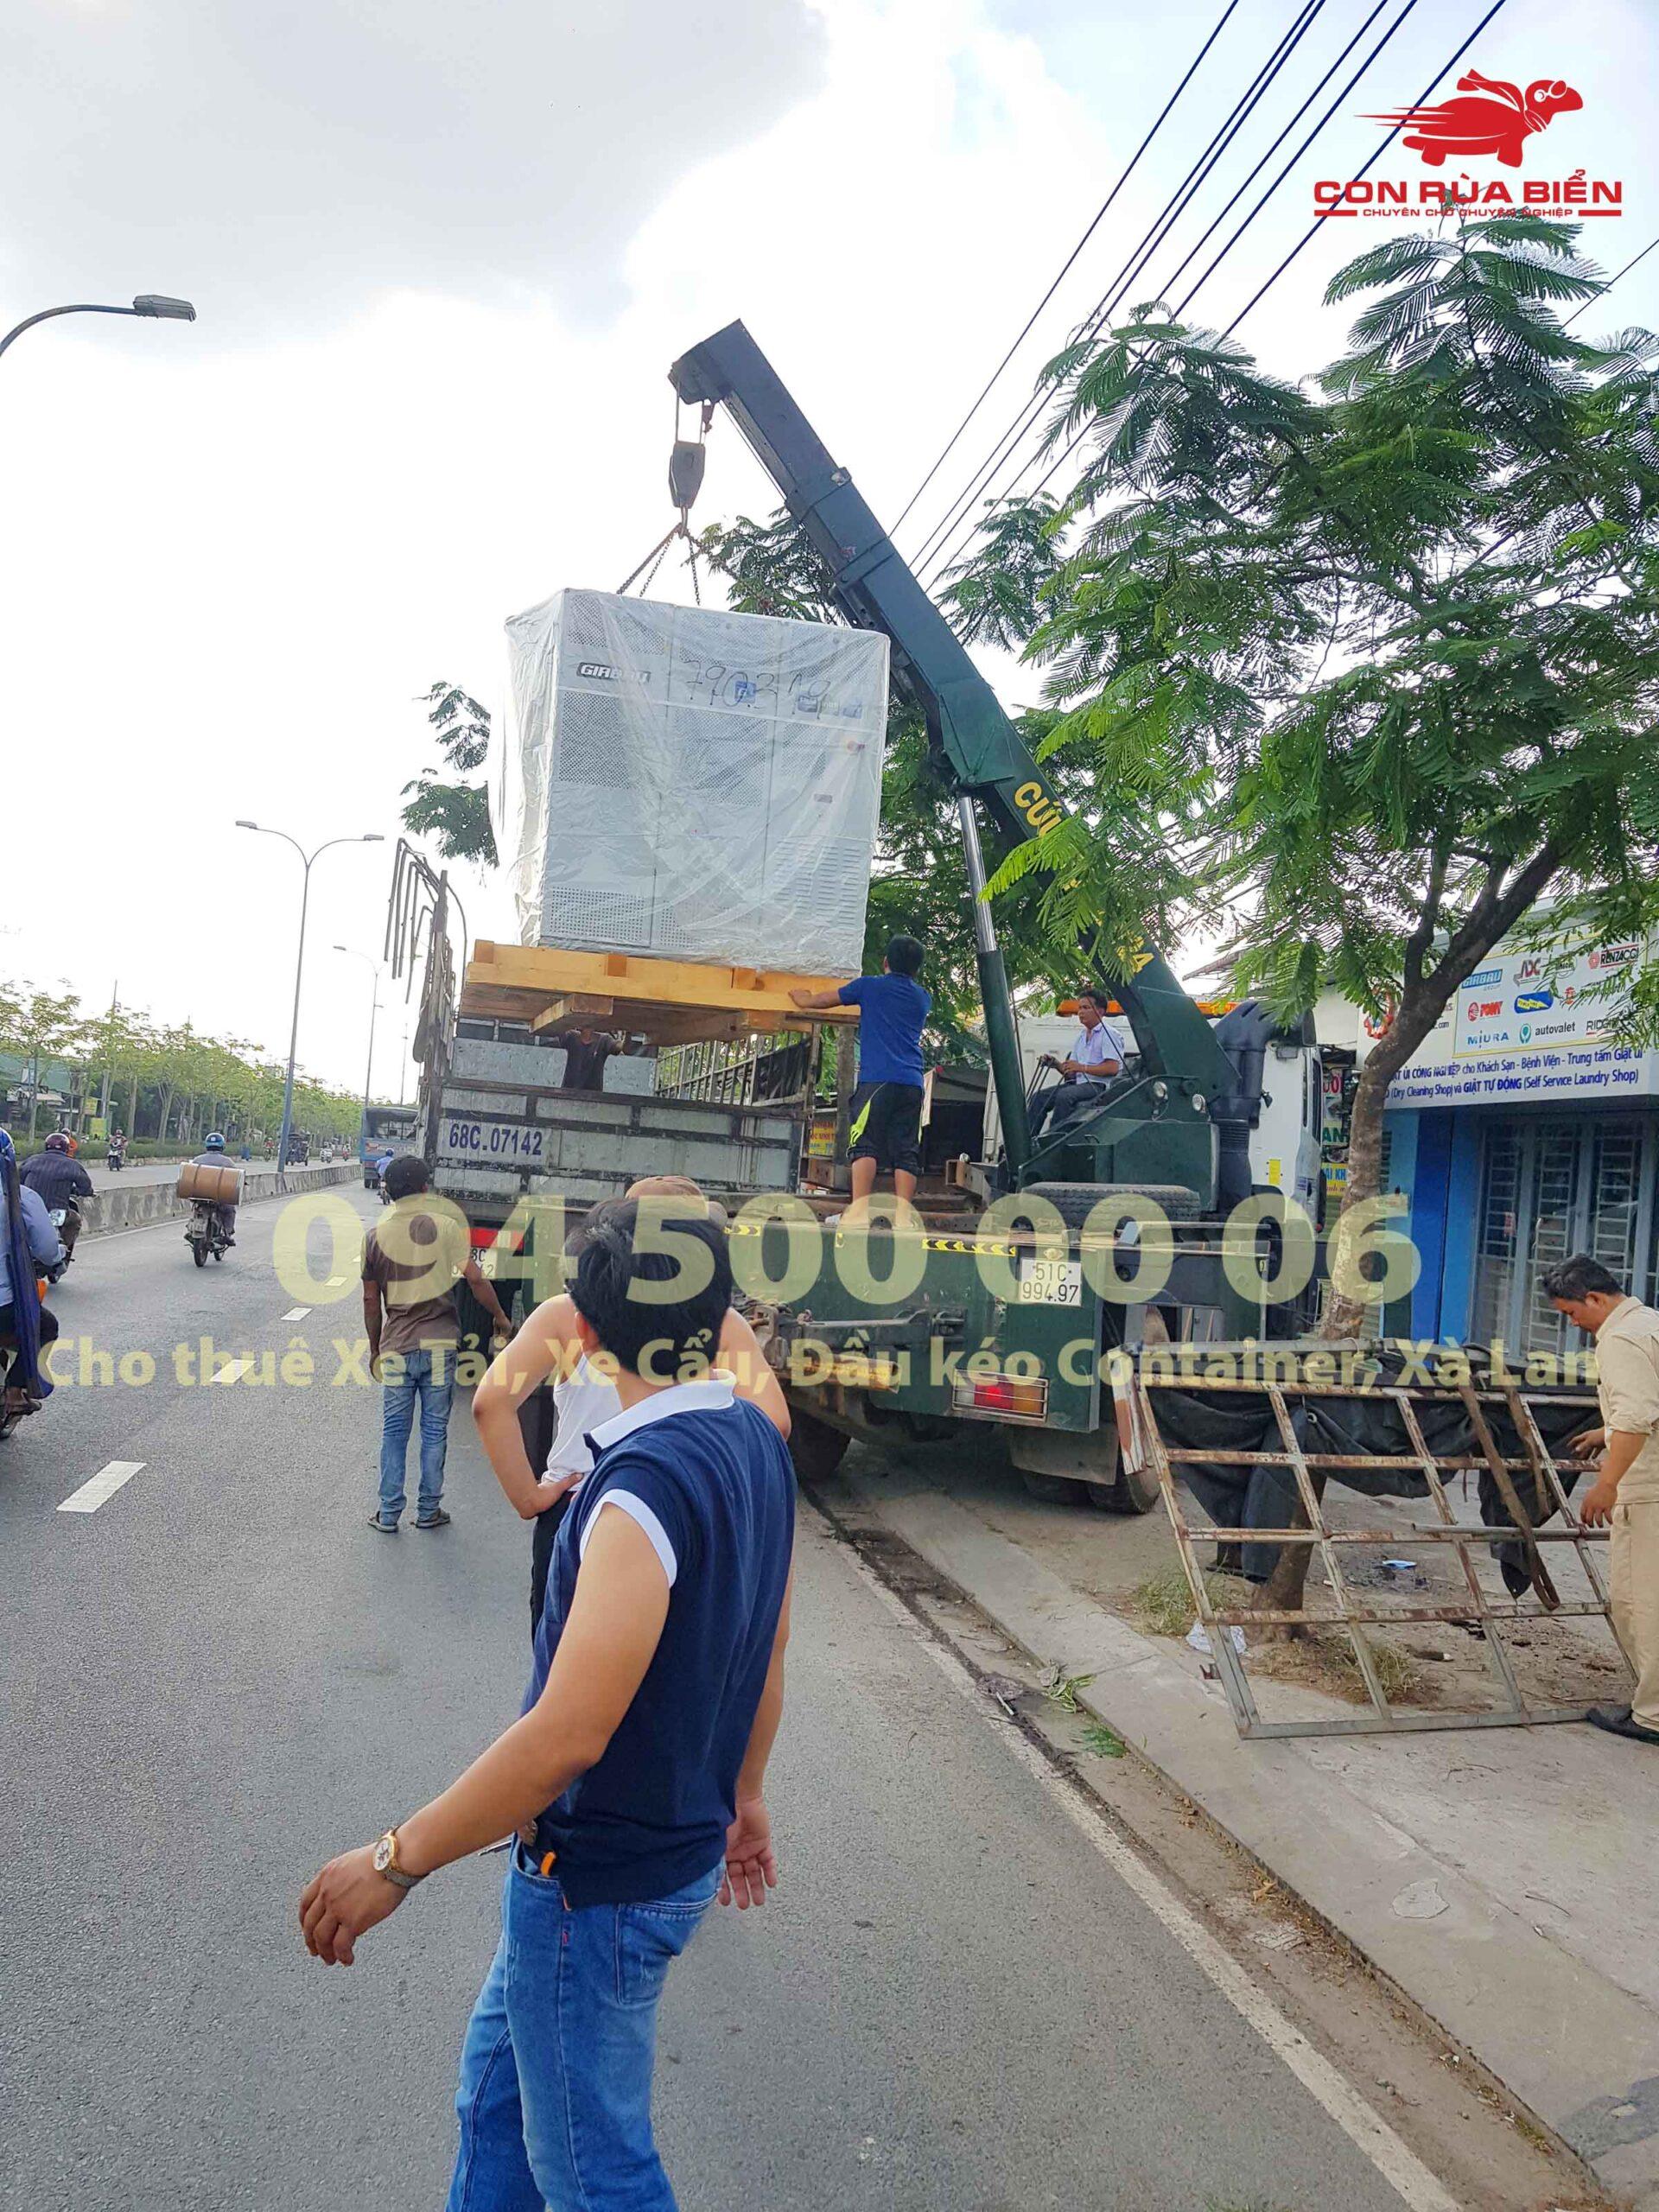 Du an Van chuyen May Giat Say Cong Nghiep di Phu Quoc 49 scaled